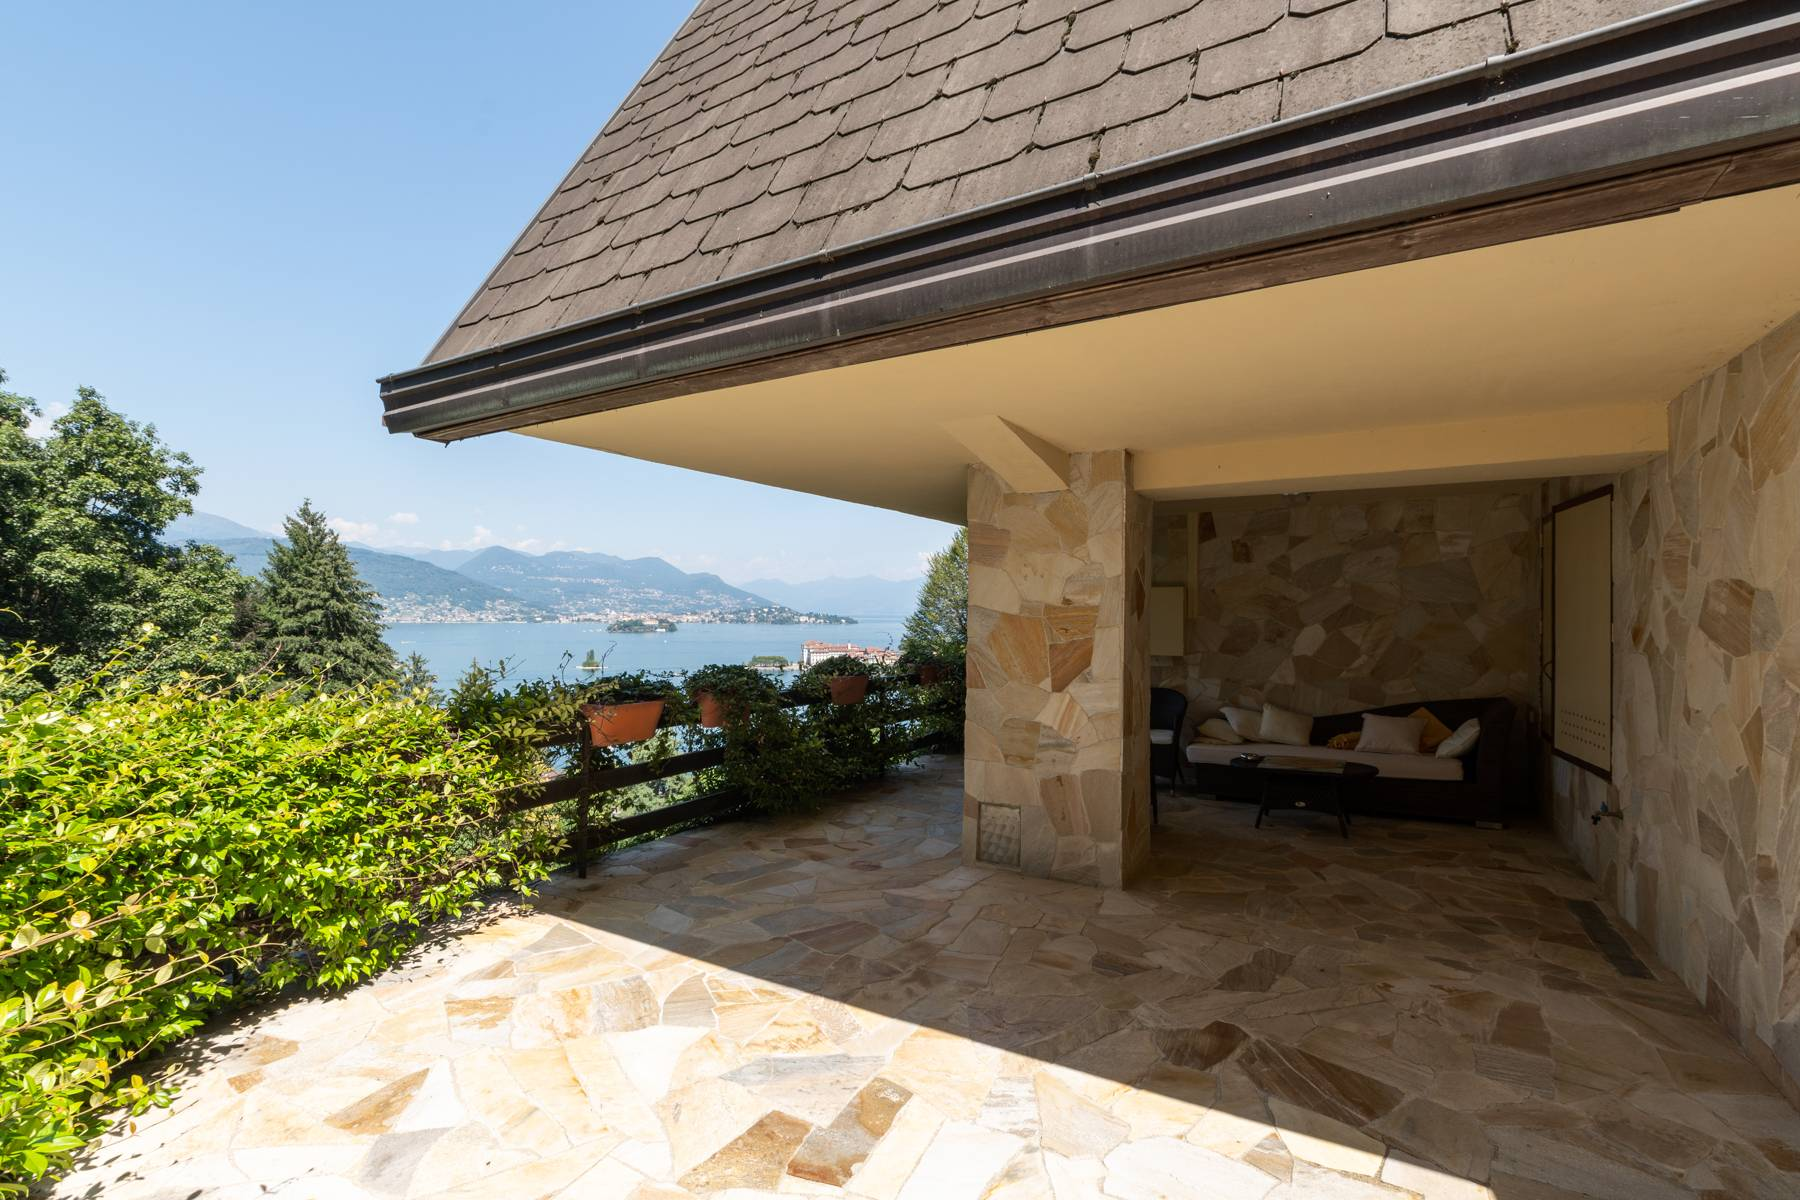 Villa in Vendita a Stresa: 5 locali, 364 mq - Foto 11